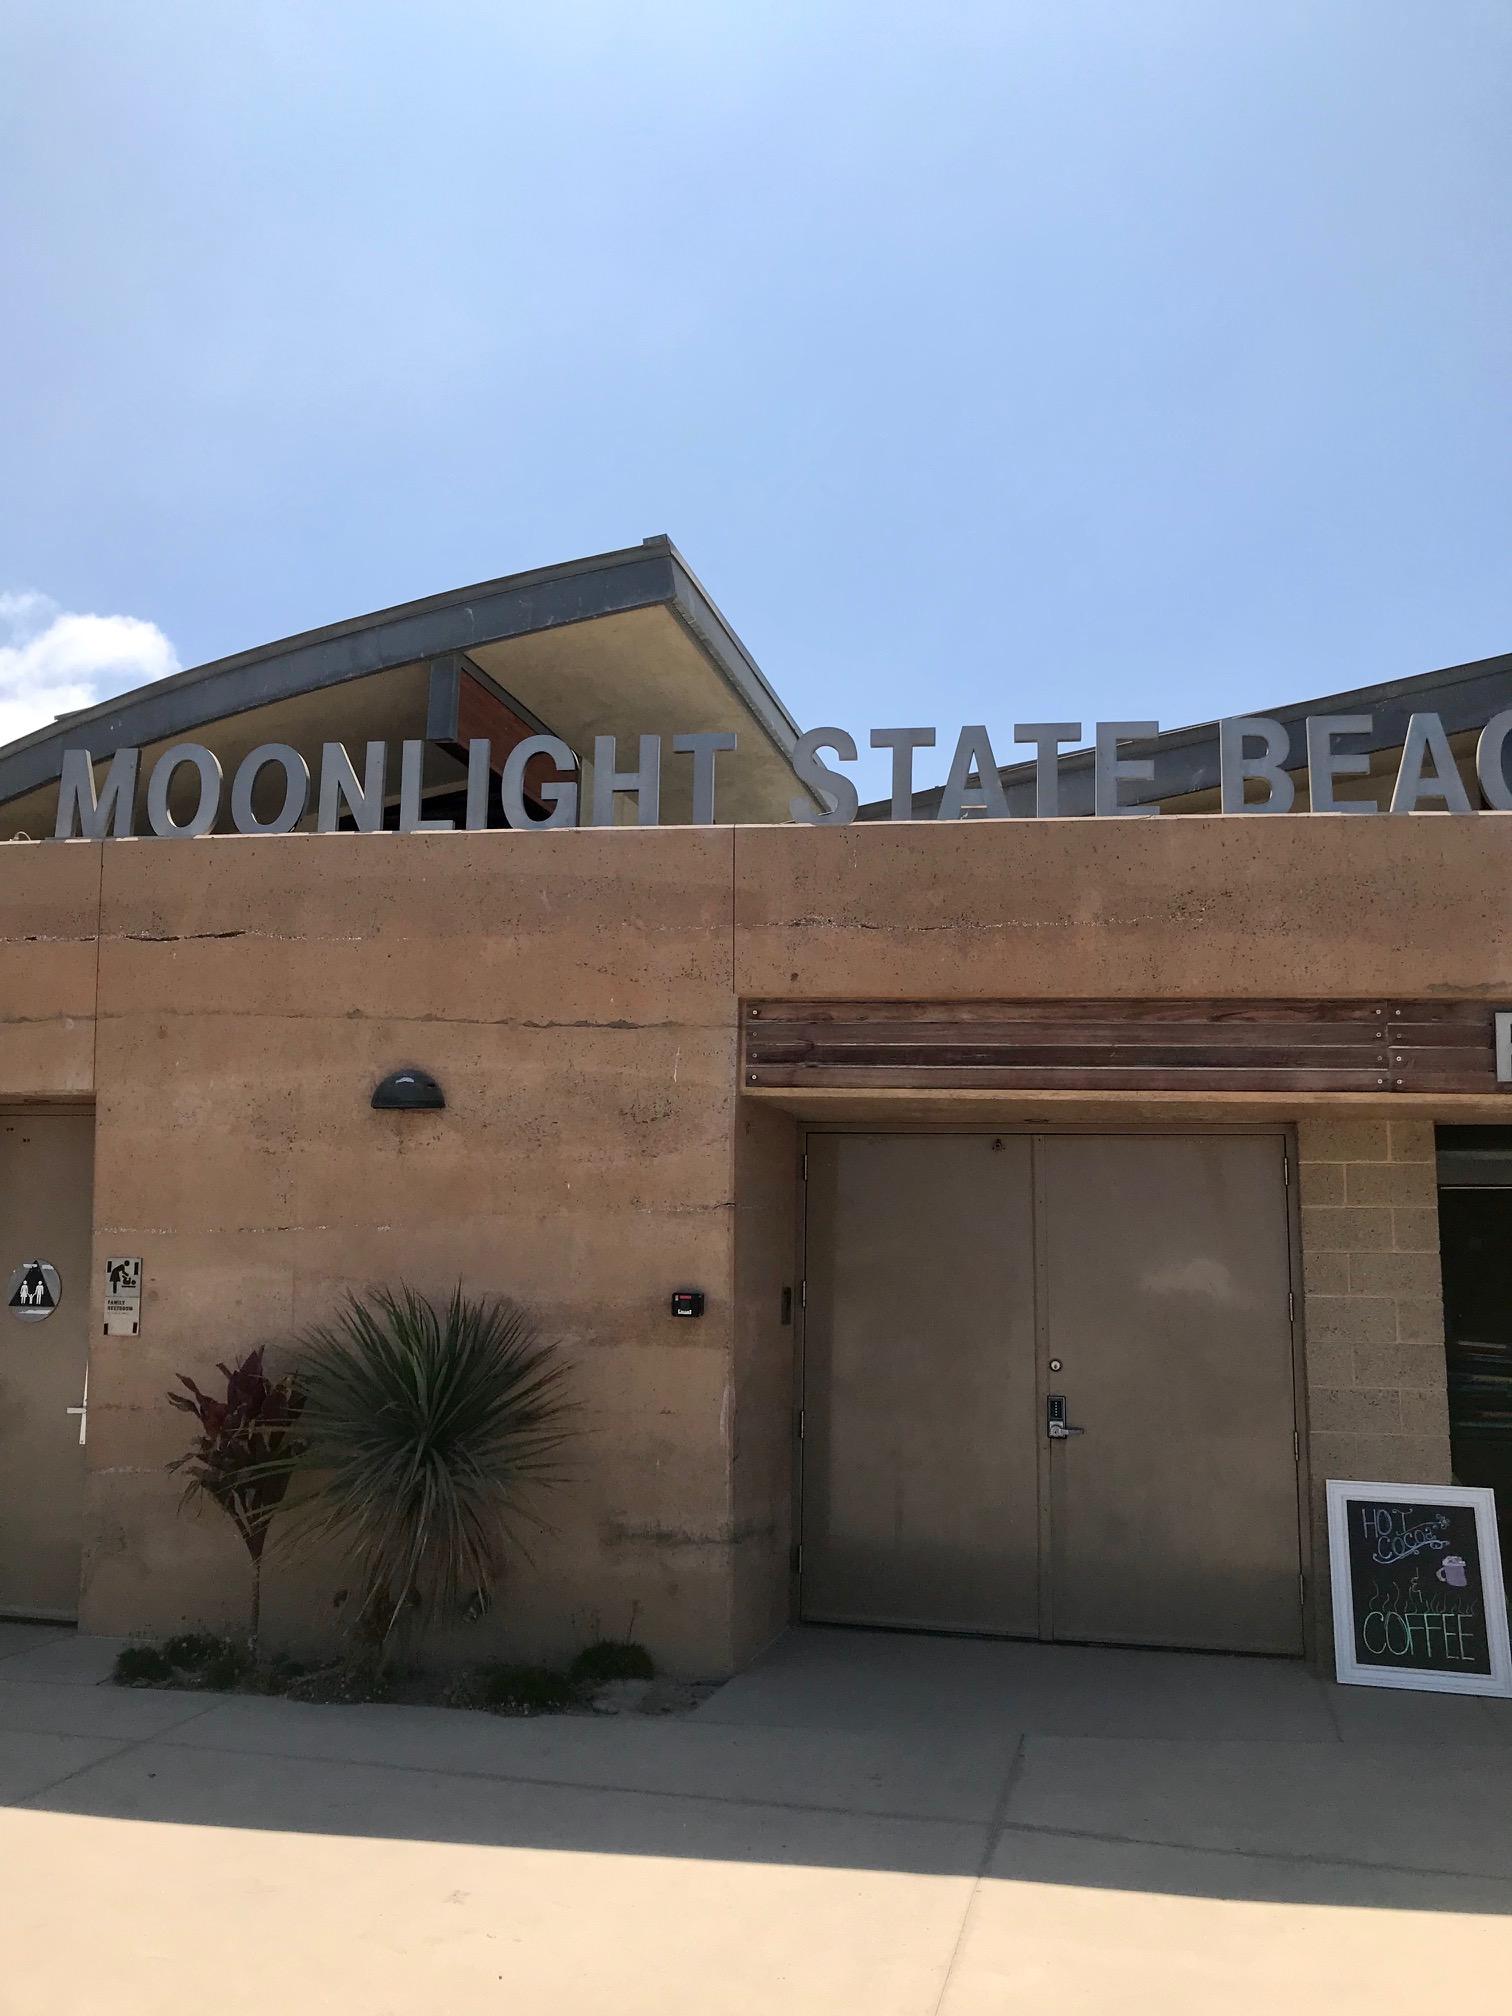 southern california beach moonlight